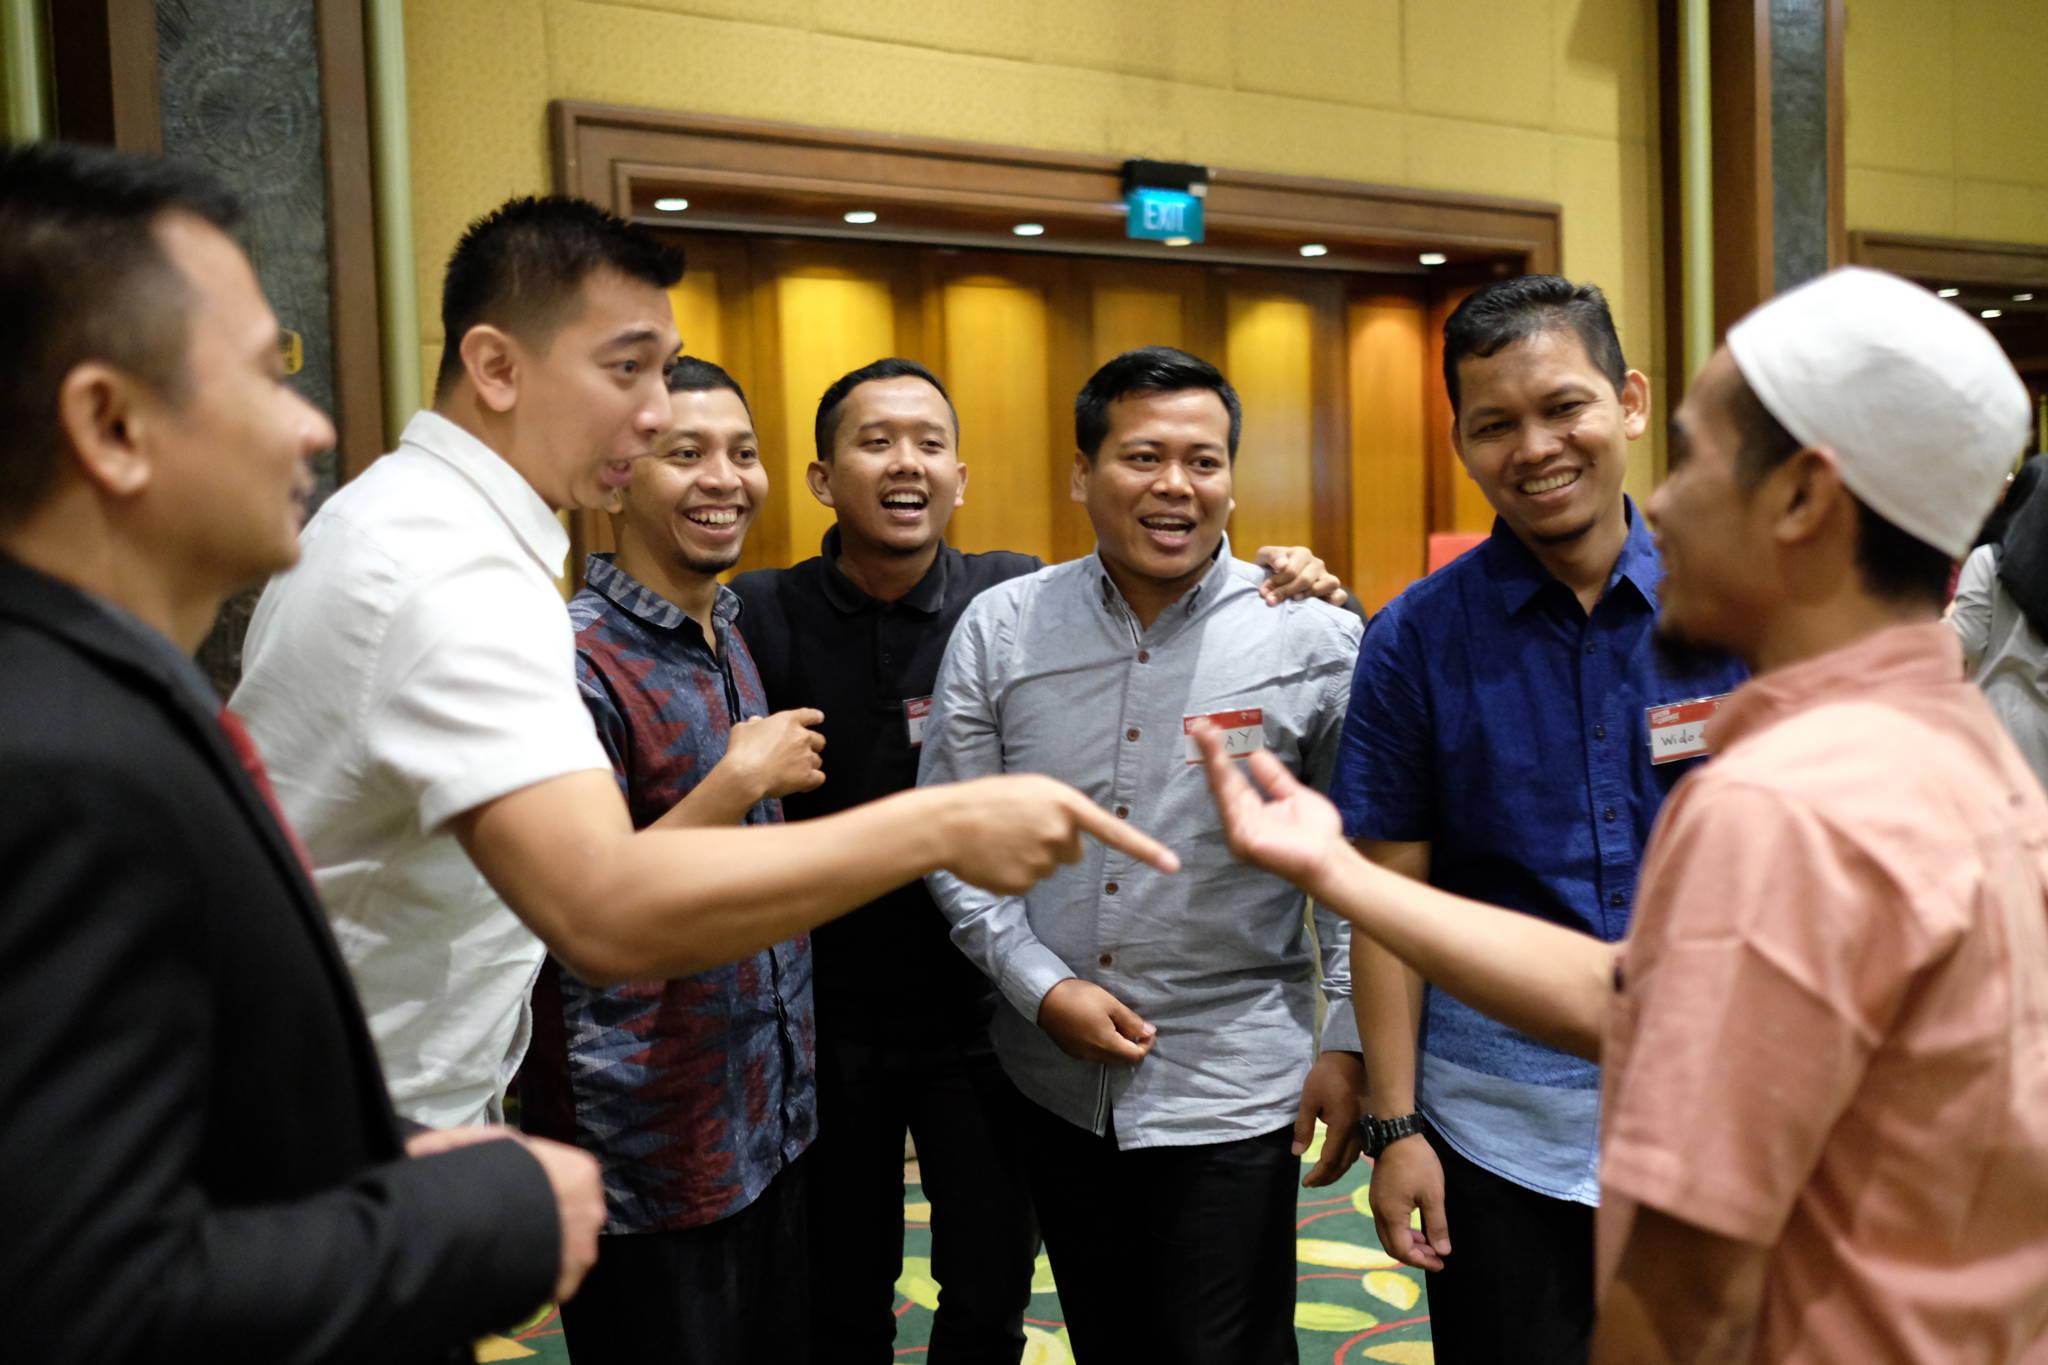 Wujudkan Event Impian Anda dengan SMART - Corporate Training Indonesia